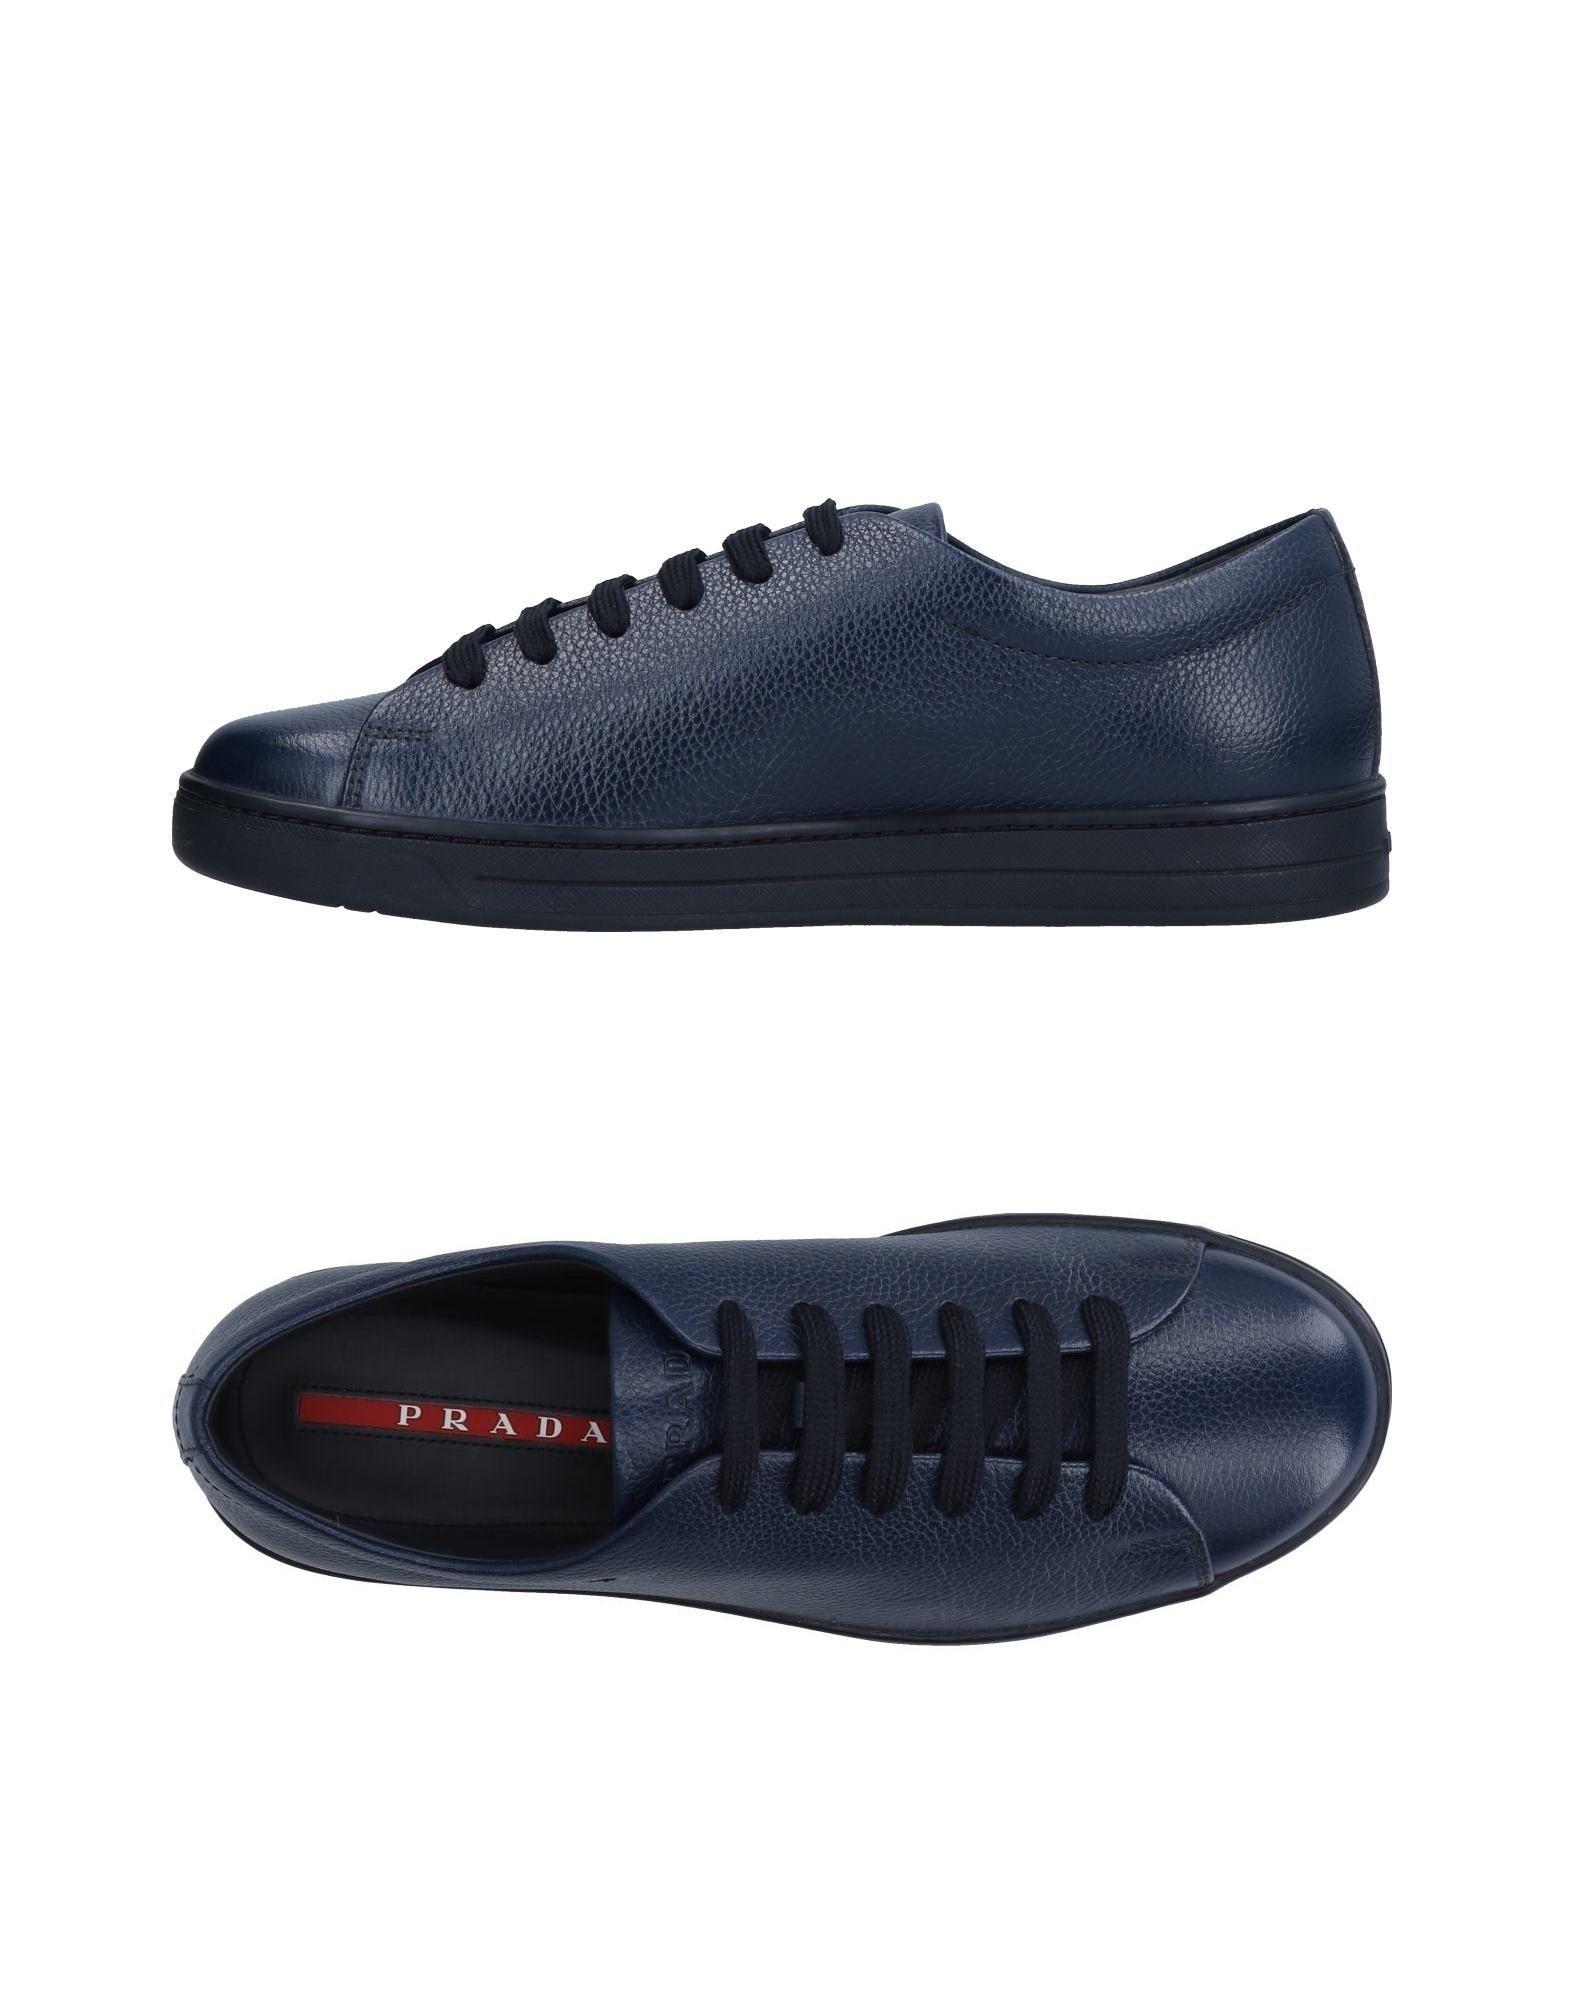 Sneakers Prada Sport Homme - Sneakers Prada Sport  Bleu foncé Chaussures femme pas cher homme et femme